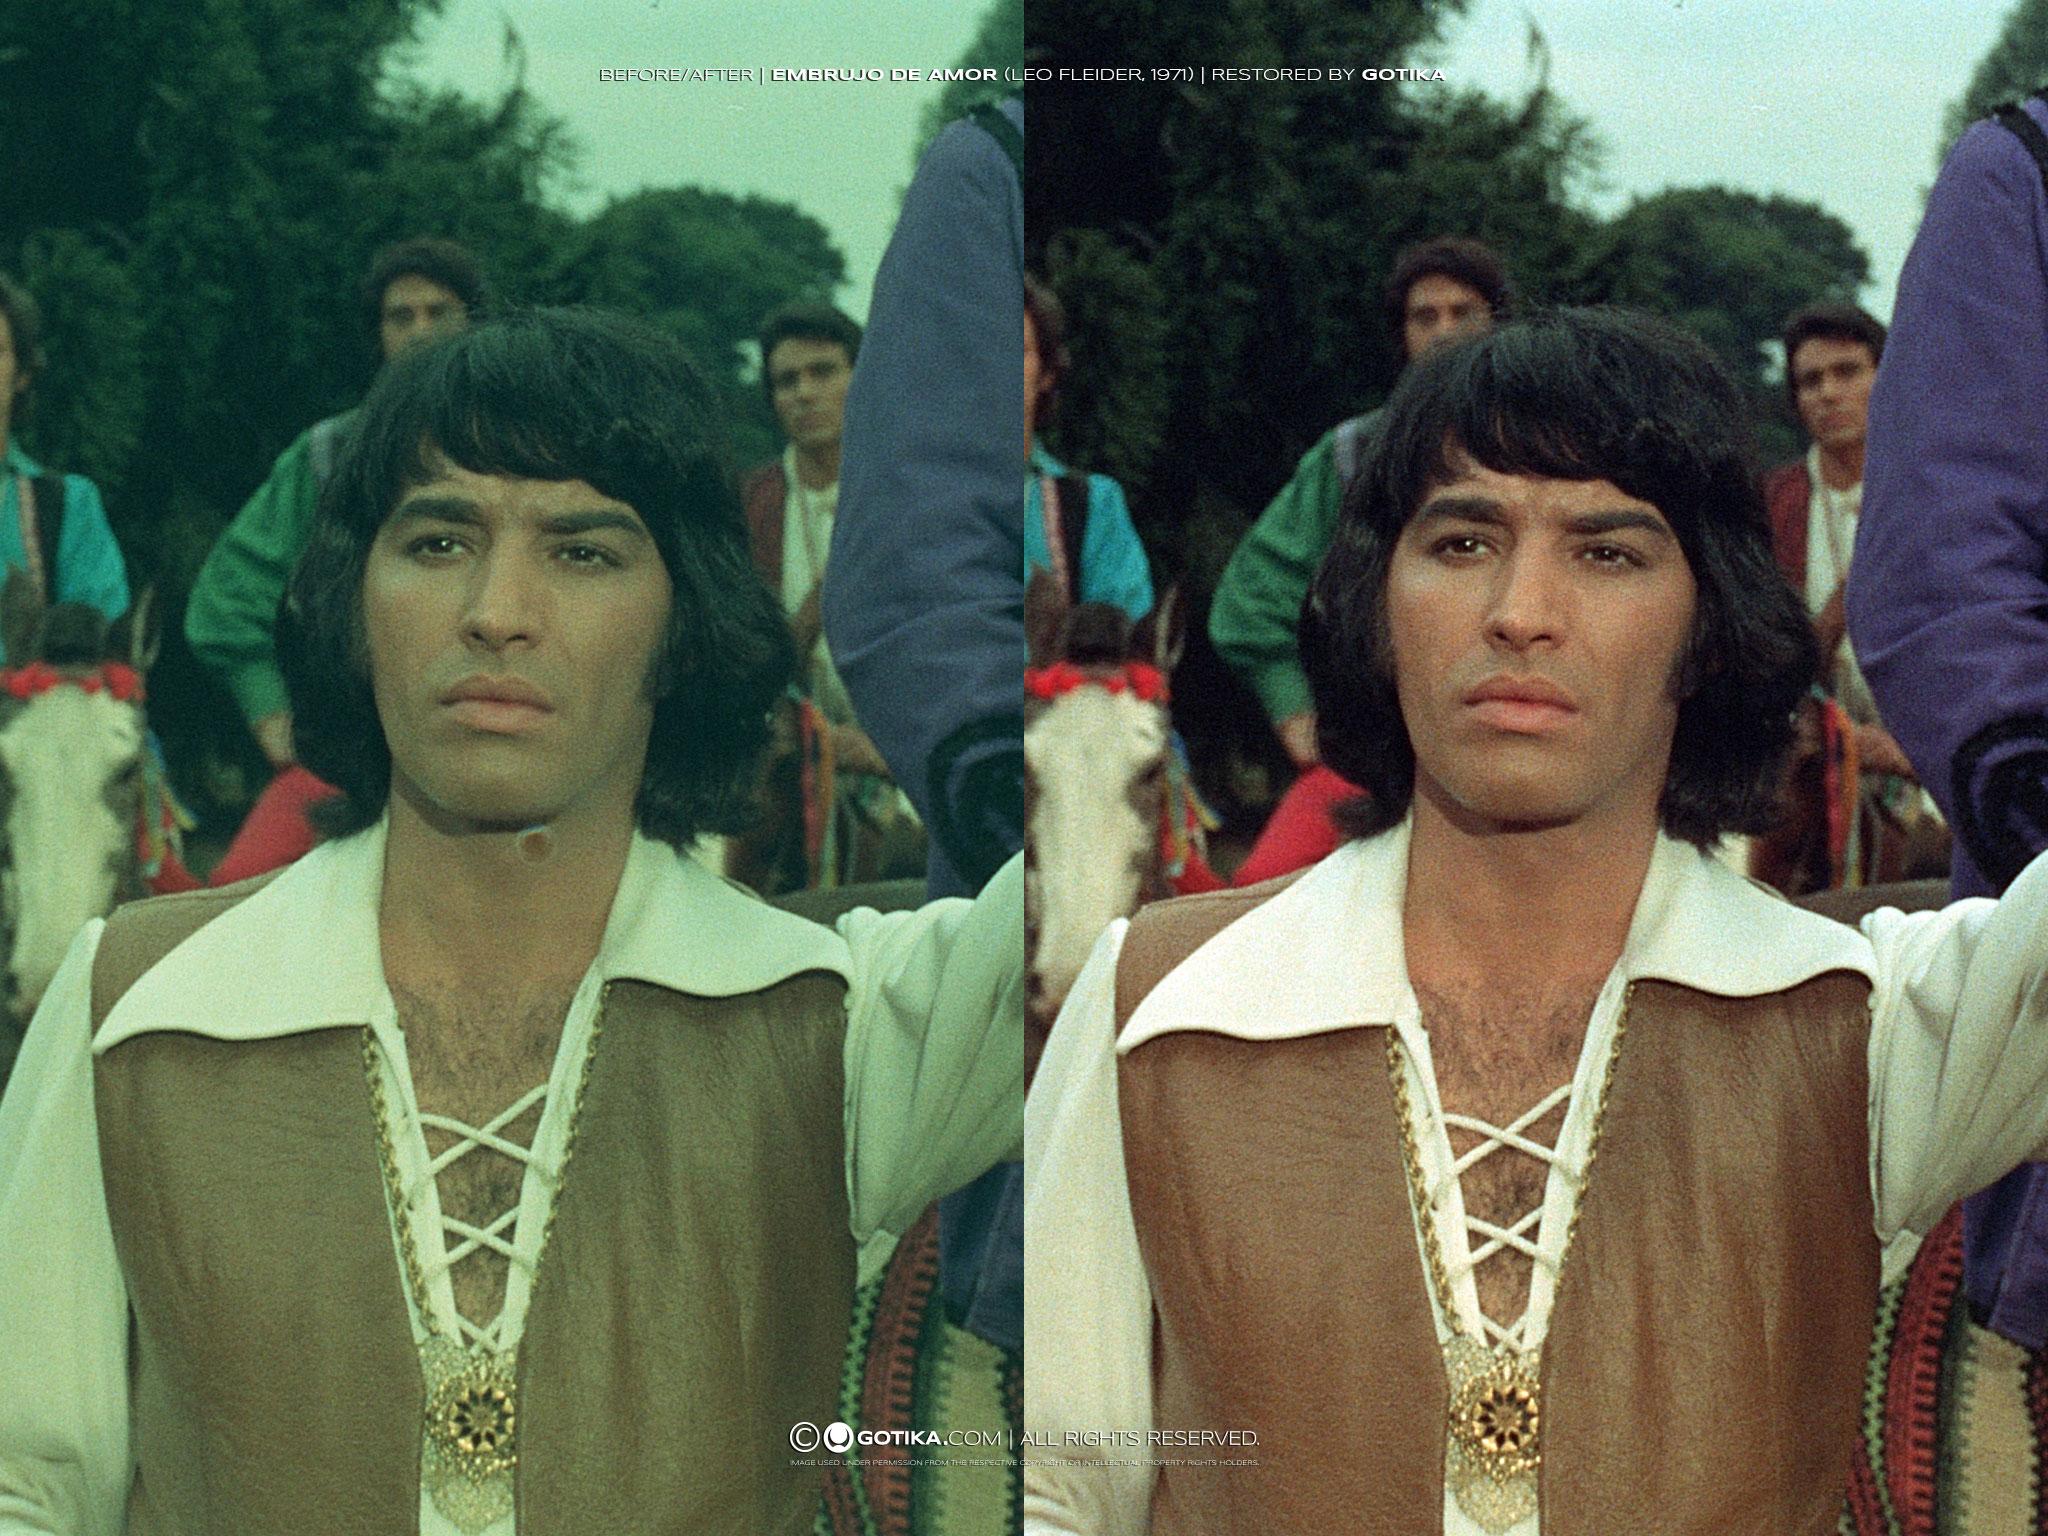 Before/After |Embrujo De Amor (Leo Fleider, 1971) | Restored by GOTIKA